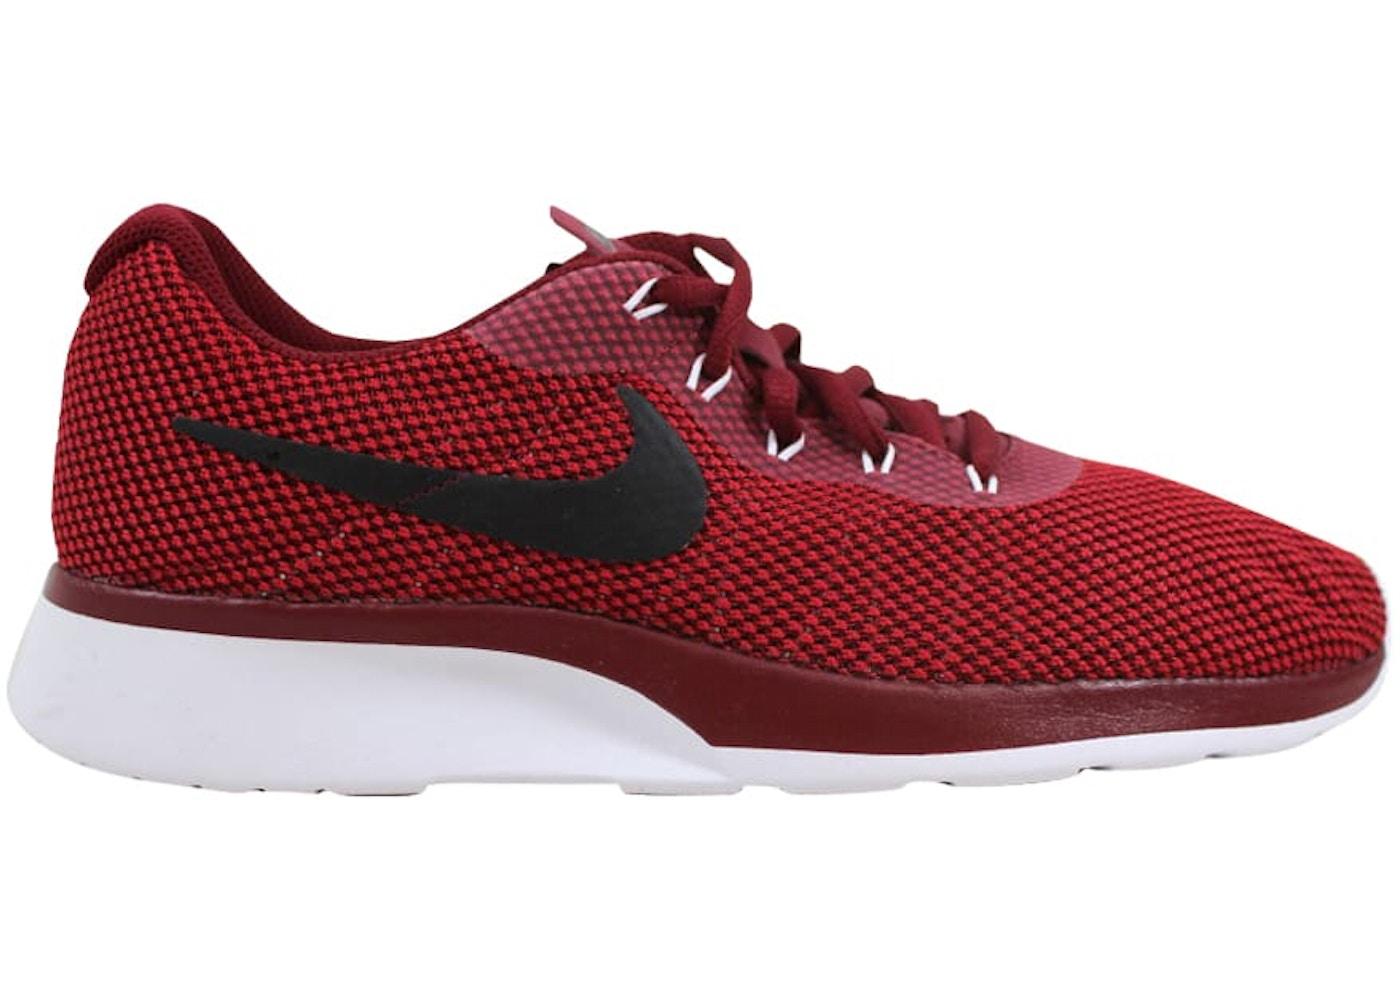 60a0521e5faa Nike Tanjun Racer Team Red Black-Gym Red-White - 921669-600